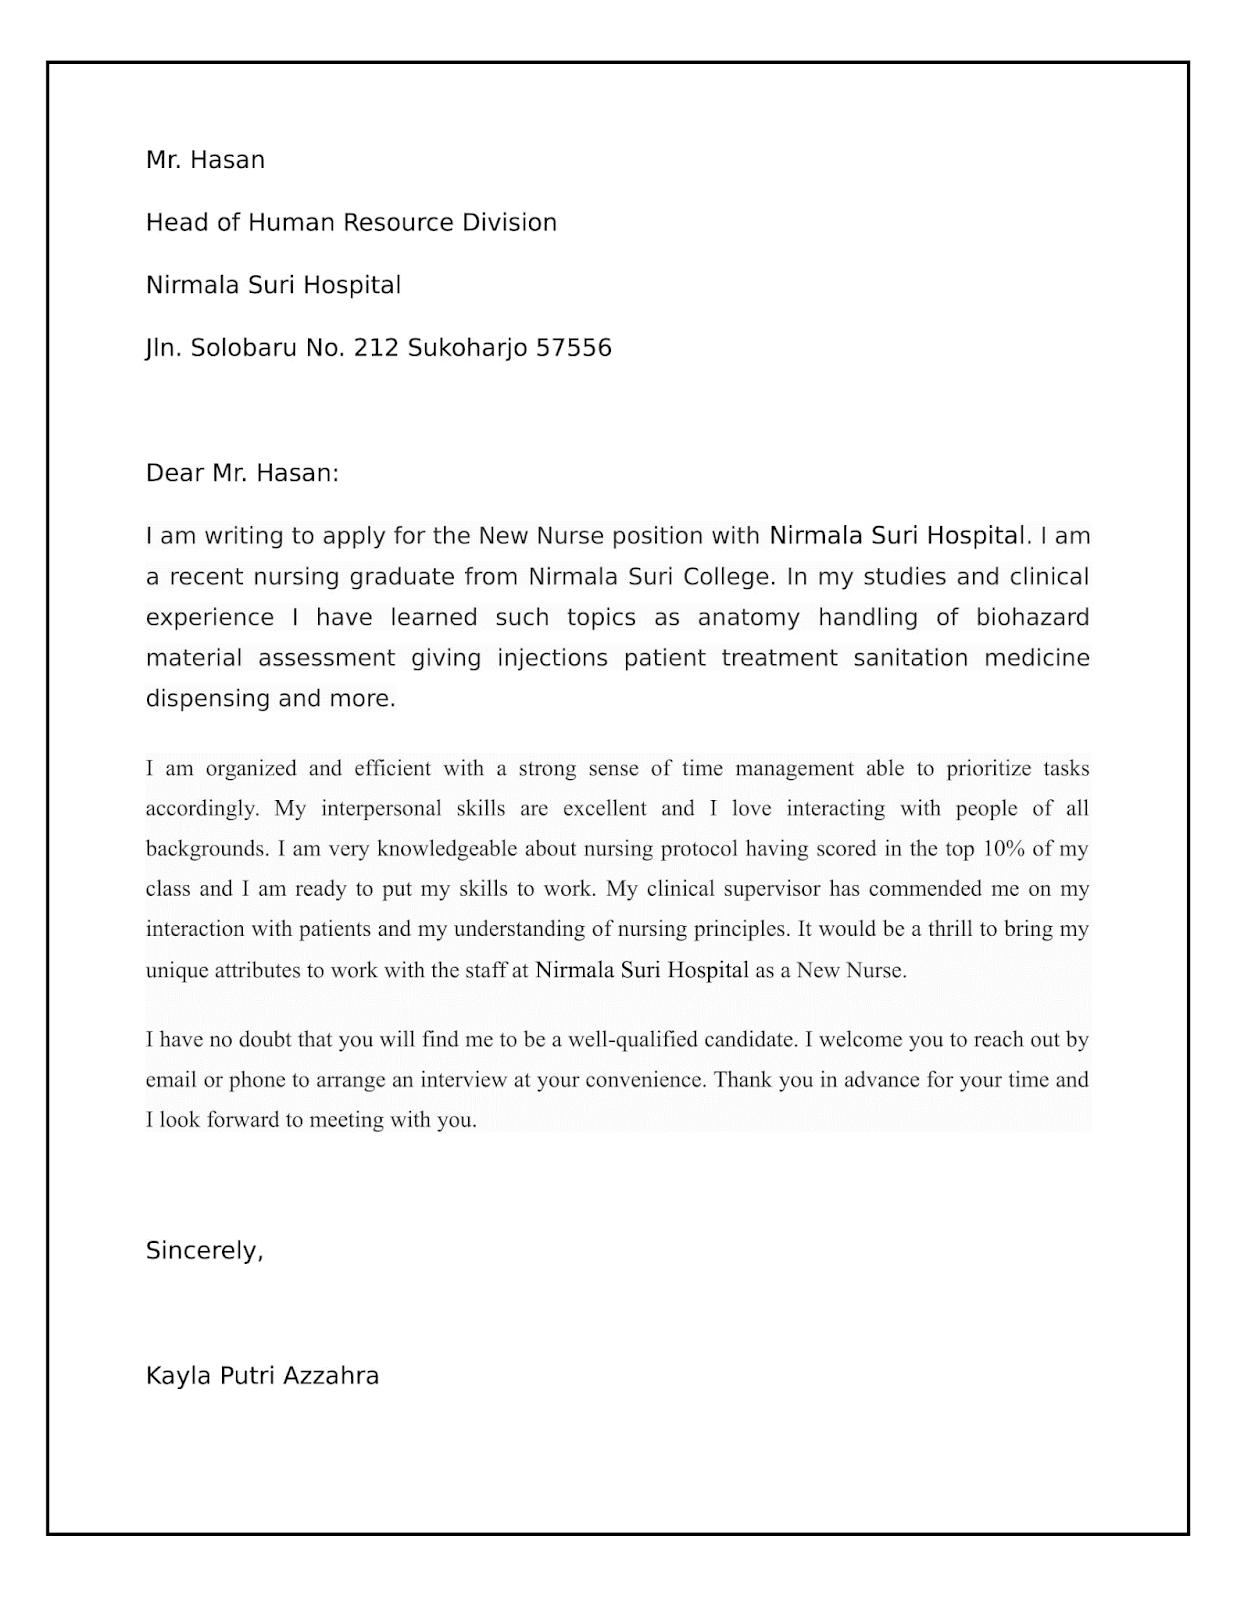 Cara Memuat Surat Contoh Surat Lamaran Pekerjaan Bahasa Inggris Dan Artinya